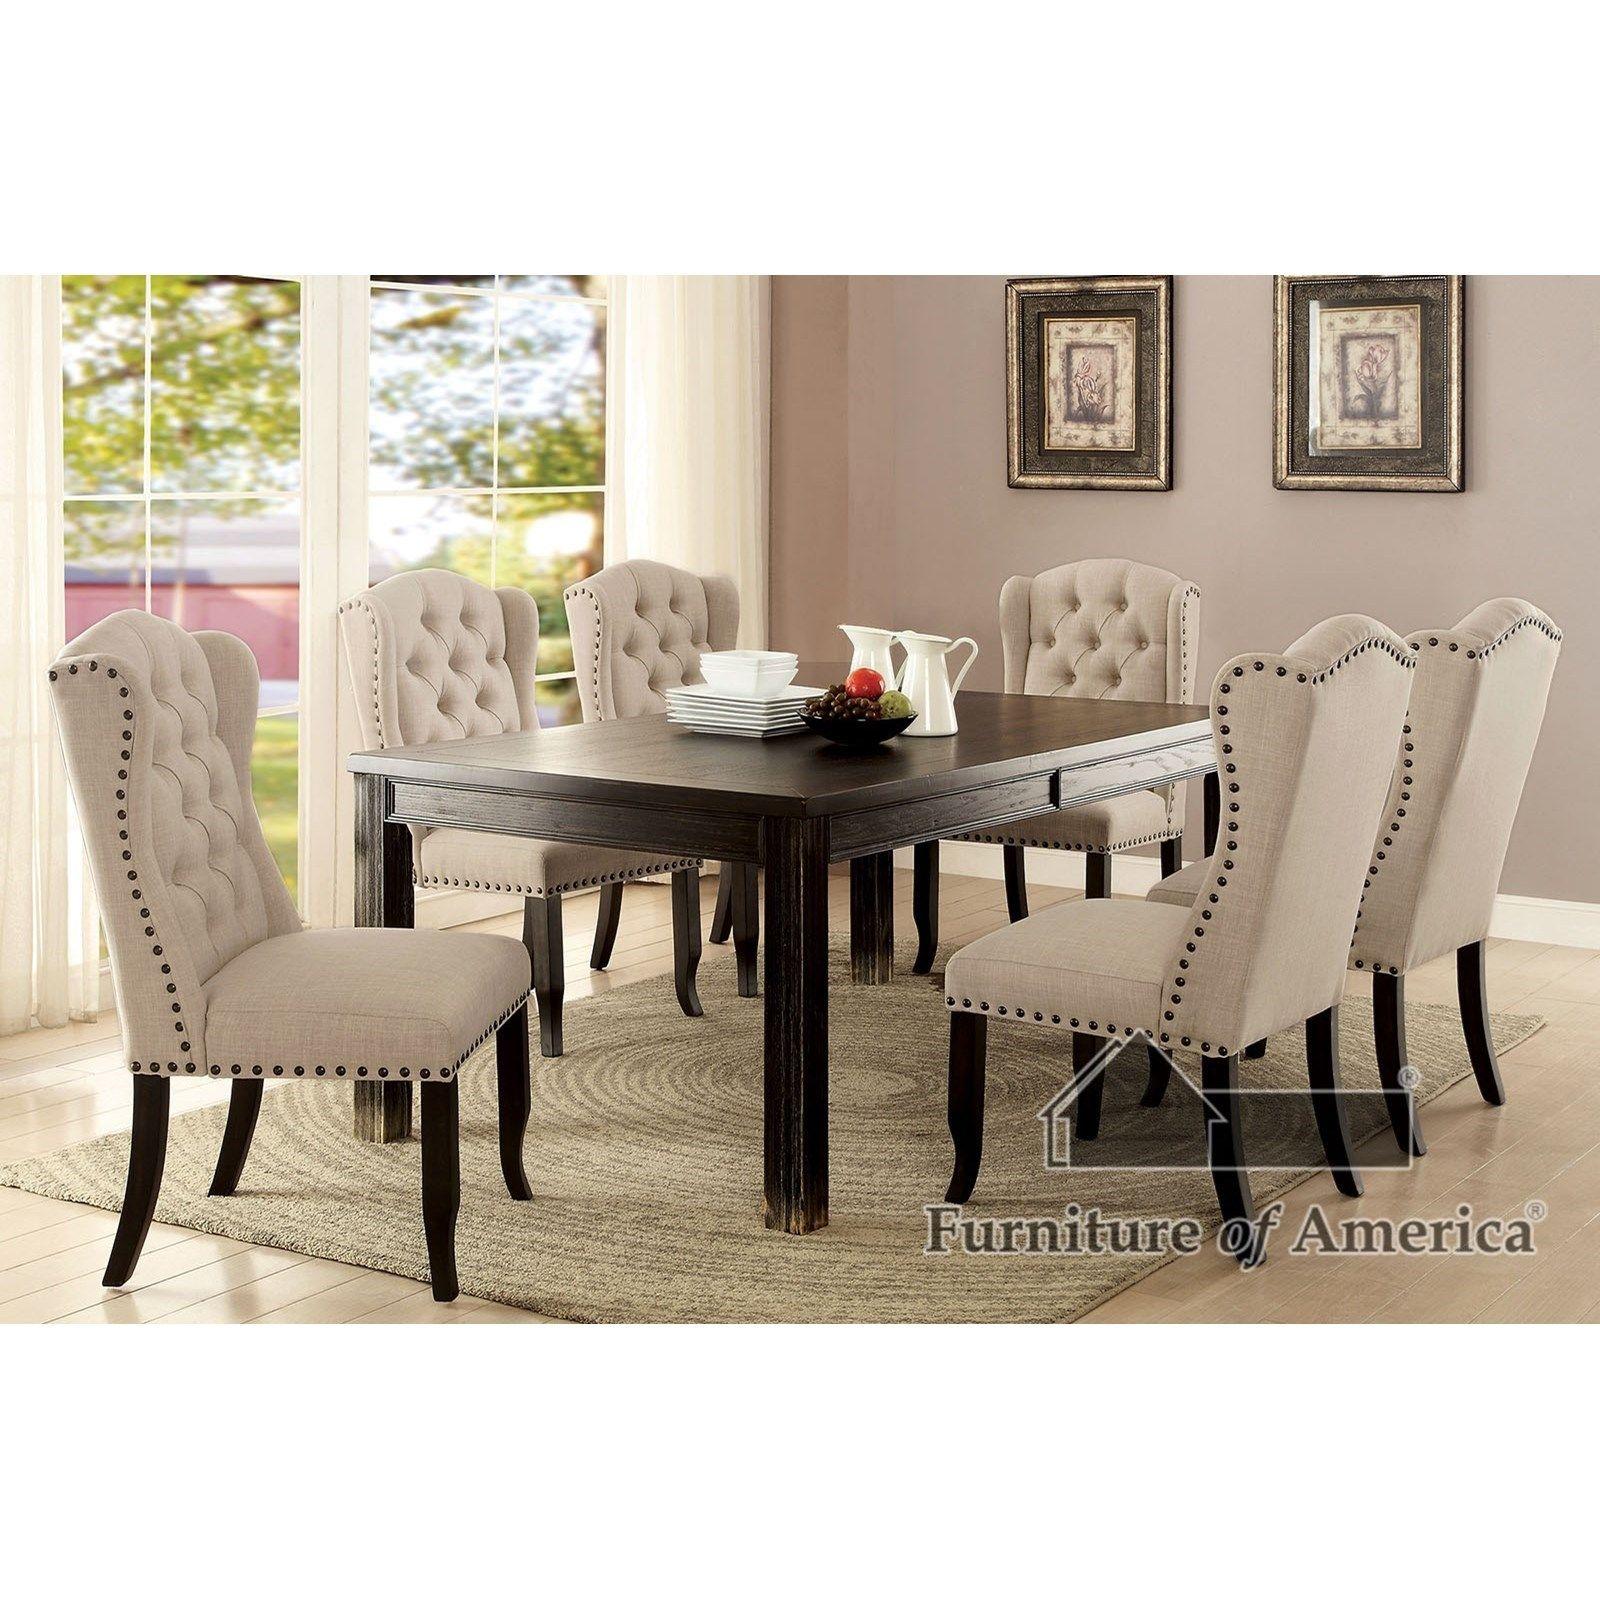 Sania Ii Bar Httable 4 Wingback Chairsfurniture Of America Amazing Upscale Dining Room Furniture Design Ideas